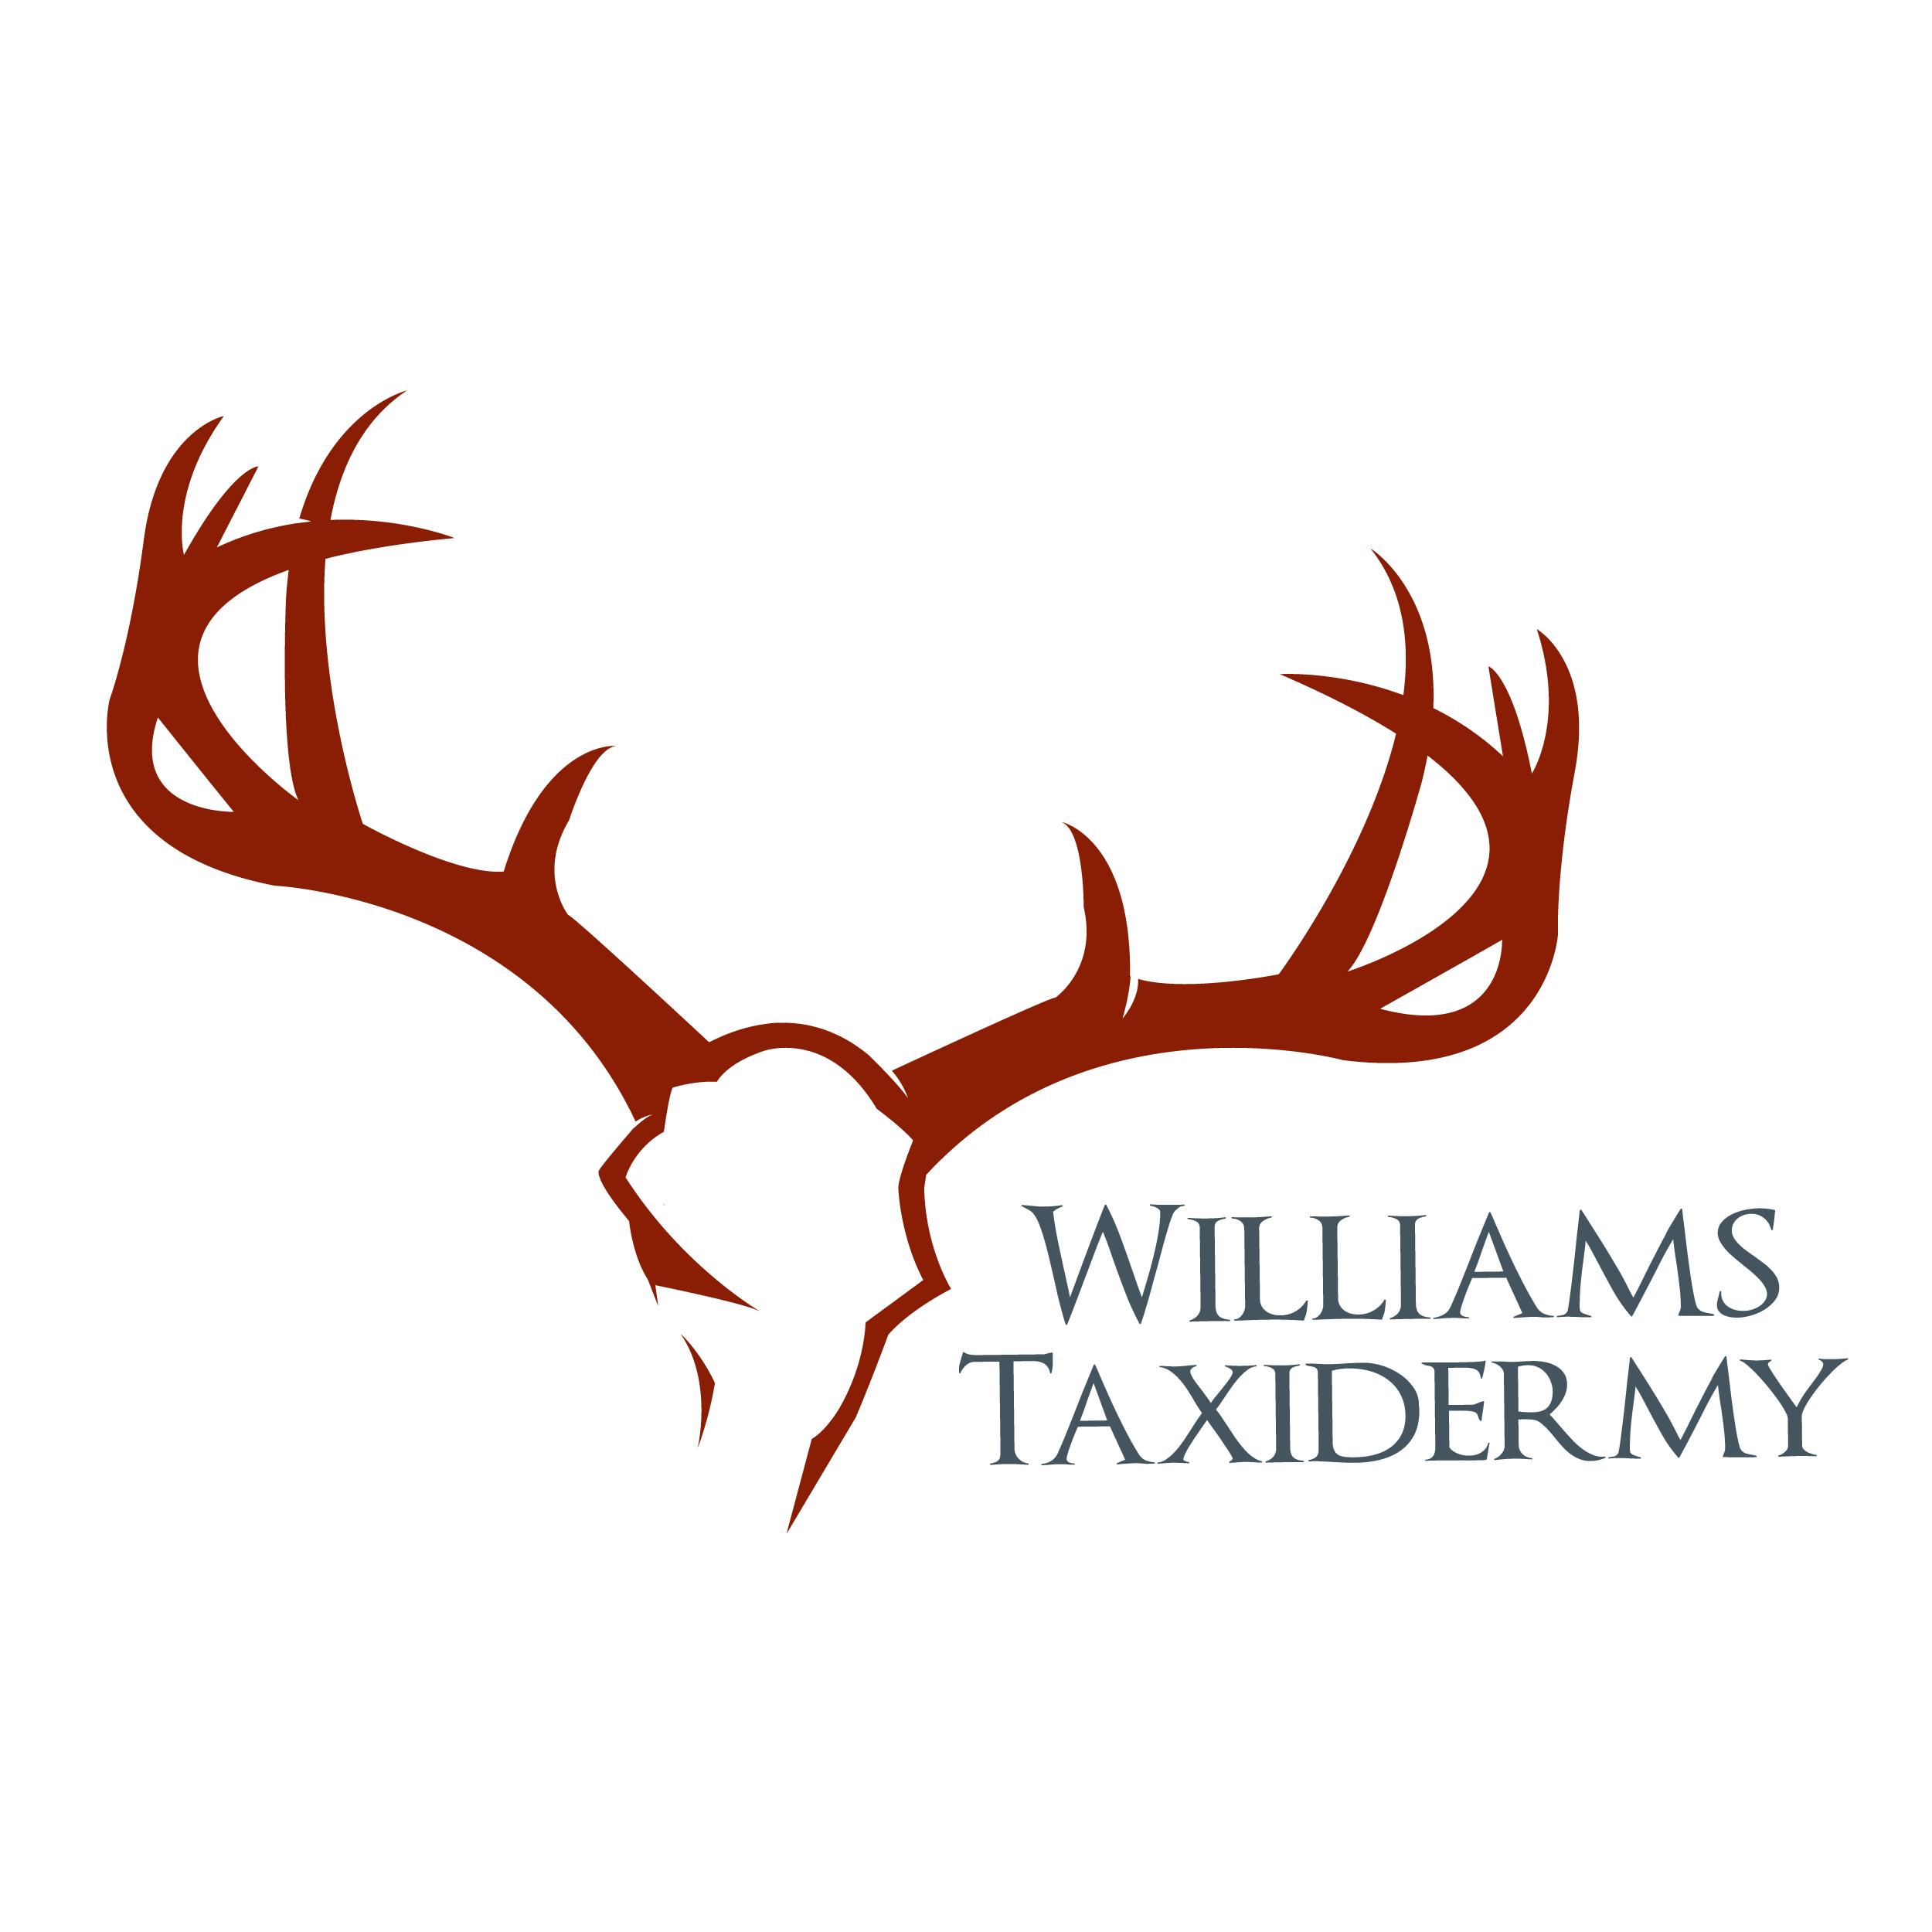 deer logos rh logolynx com deer logos free deer logo images